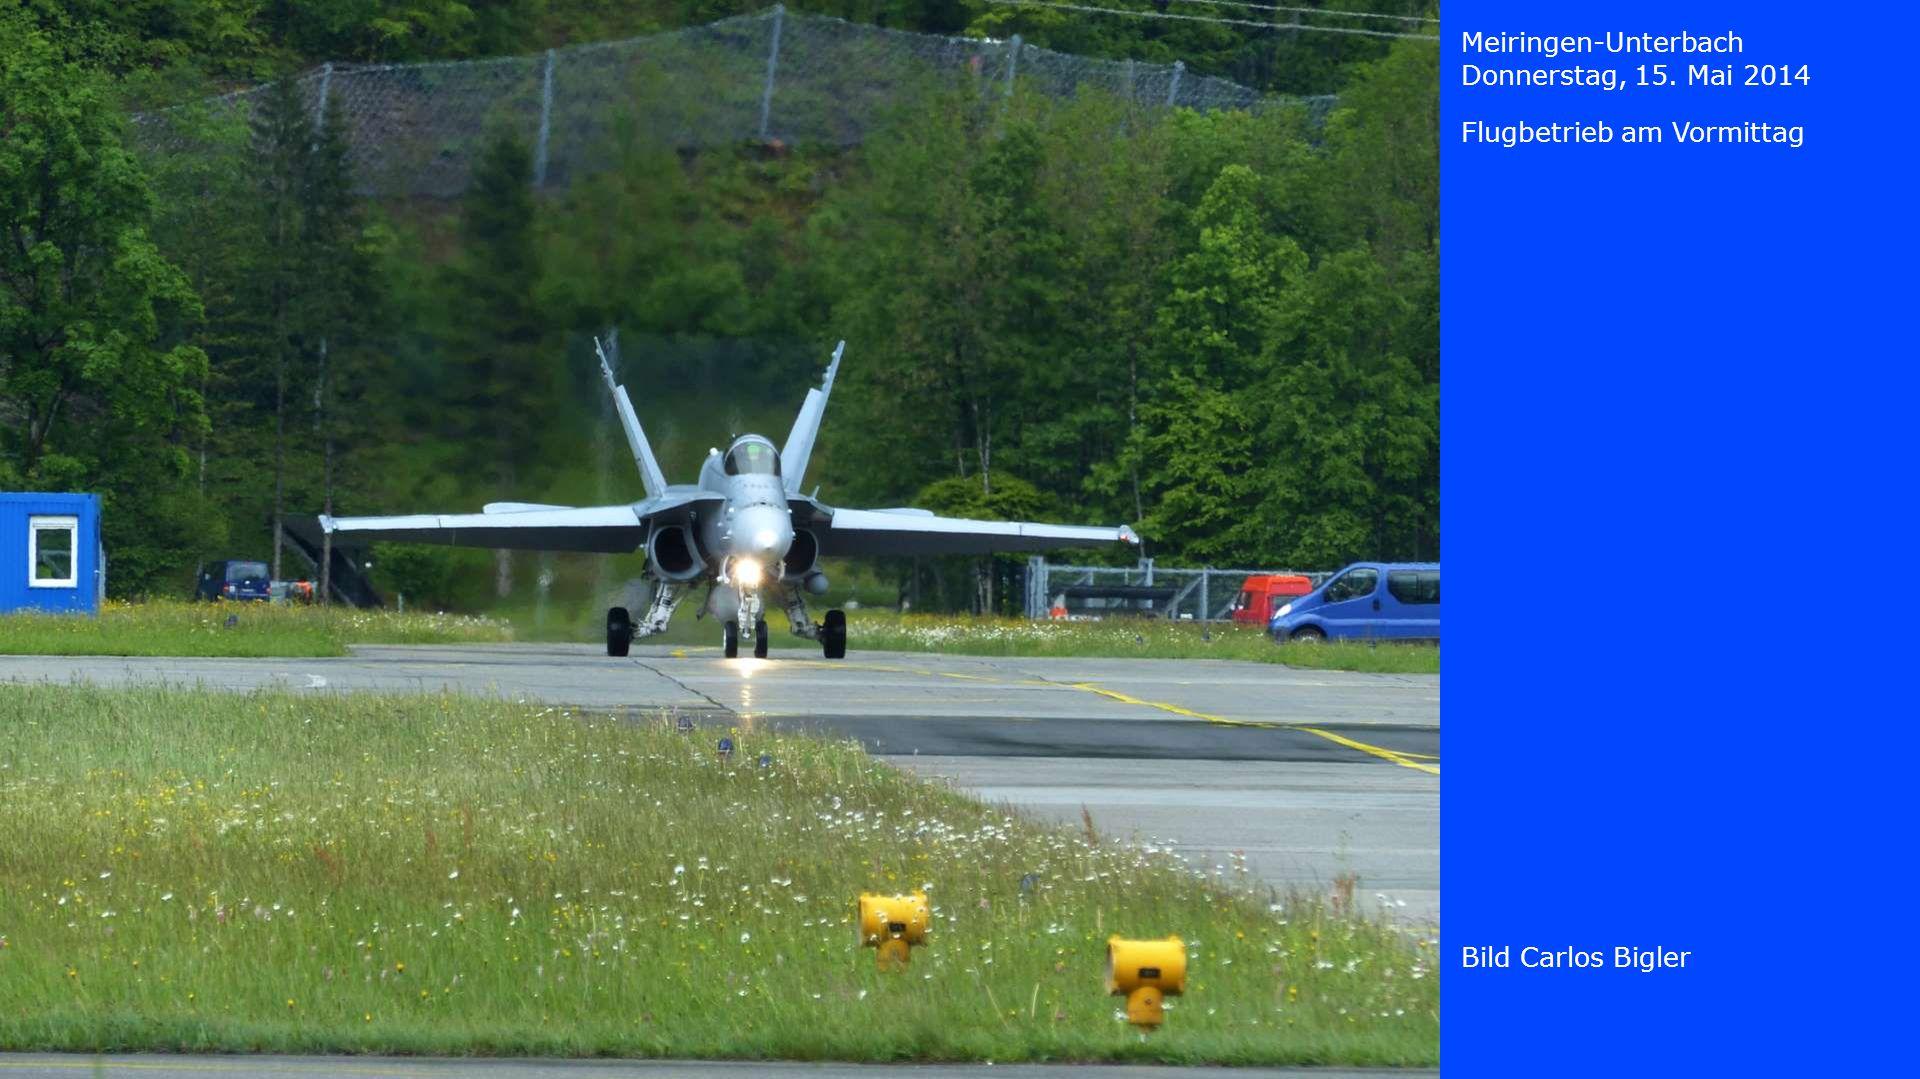 Meiringen-Unterbach Donnerstag, 15. Mai 2014 Bild Carlos Bigler Flugbetrieb am Vormittag